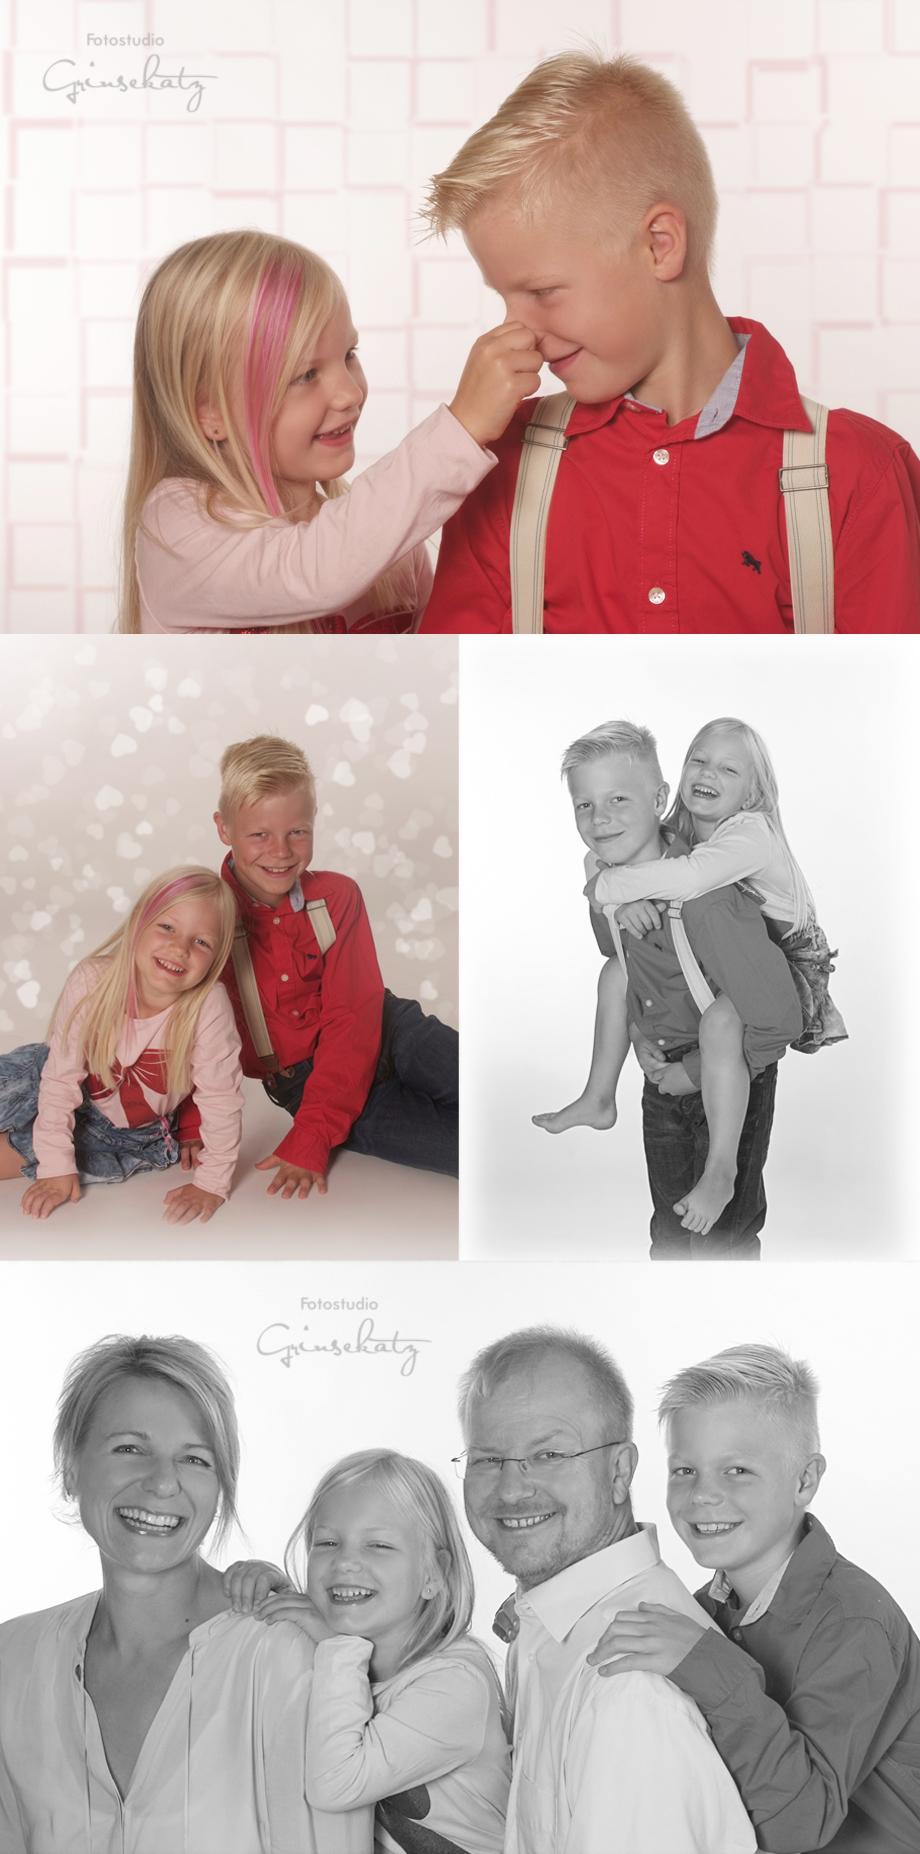 photography family grinsekatz